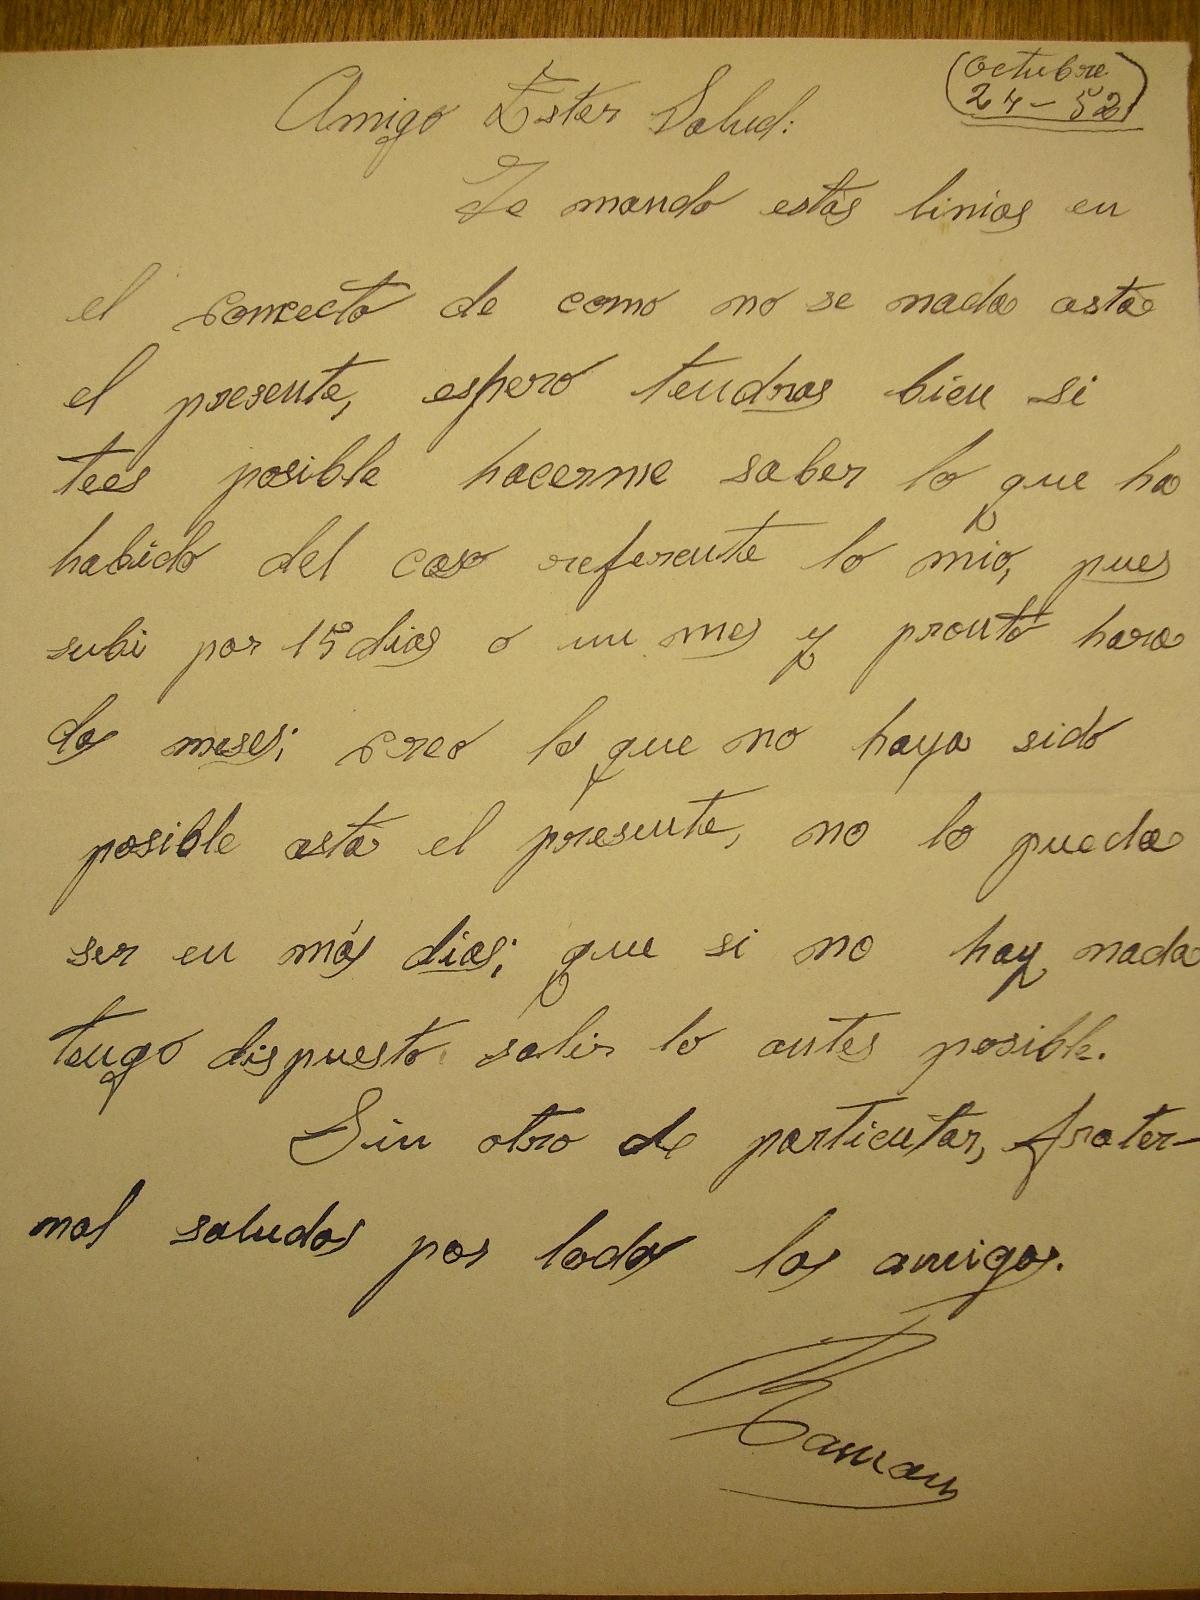 Carta remitida por Ramón Vila a Josep Ester, el 24 de octubre de 1952.